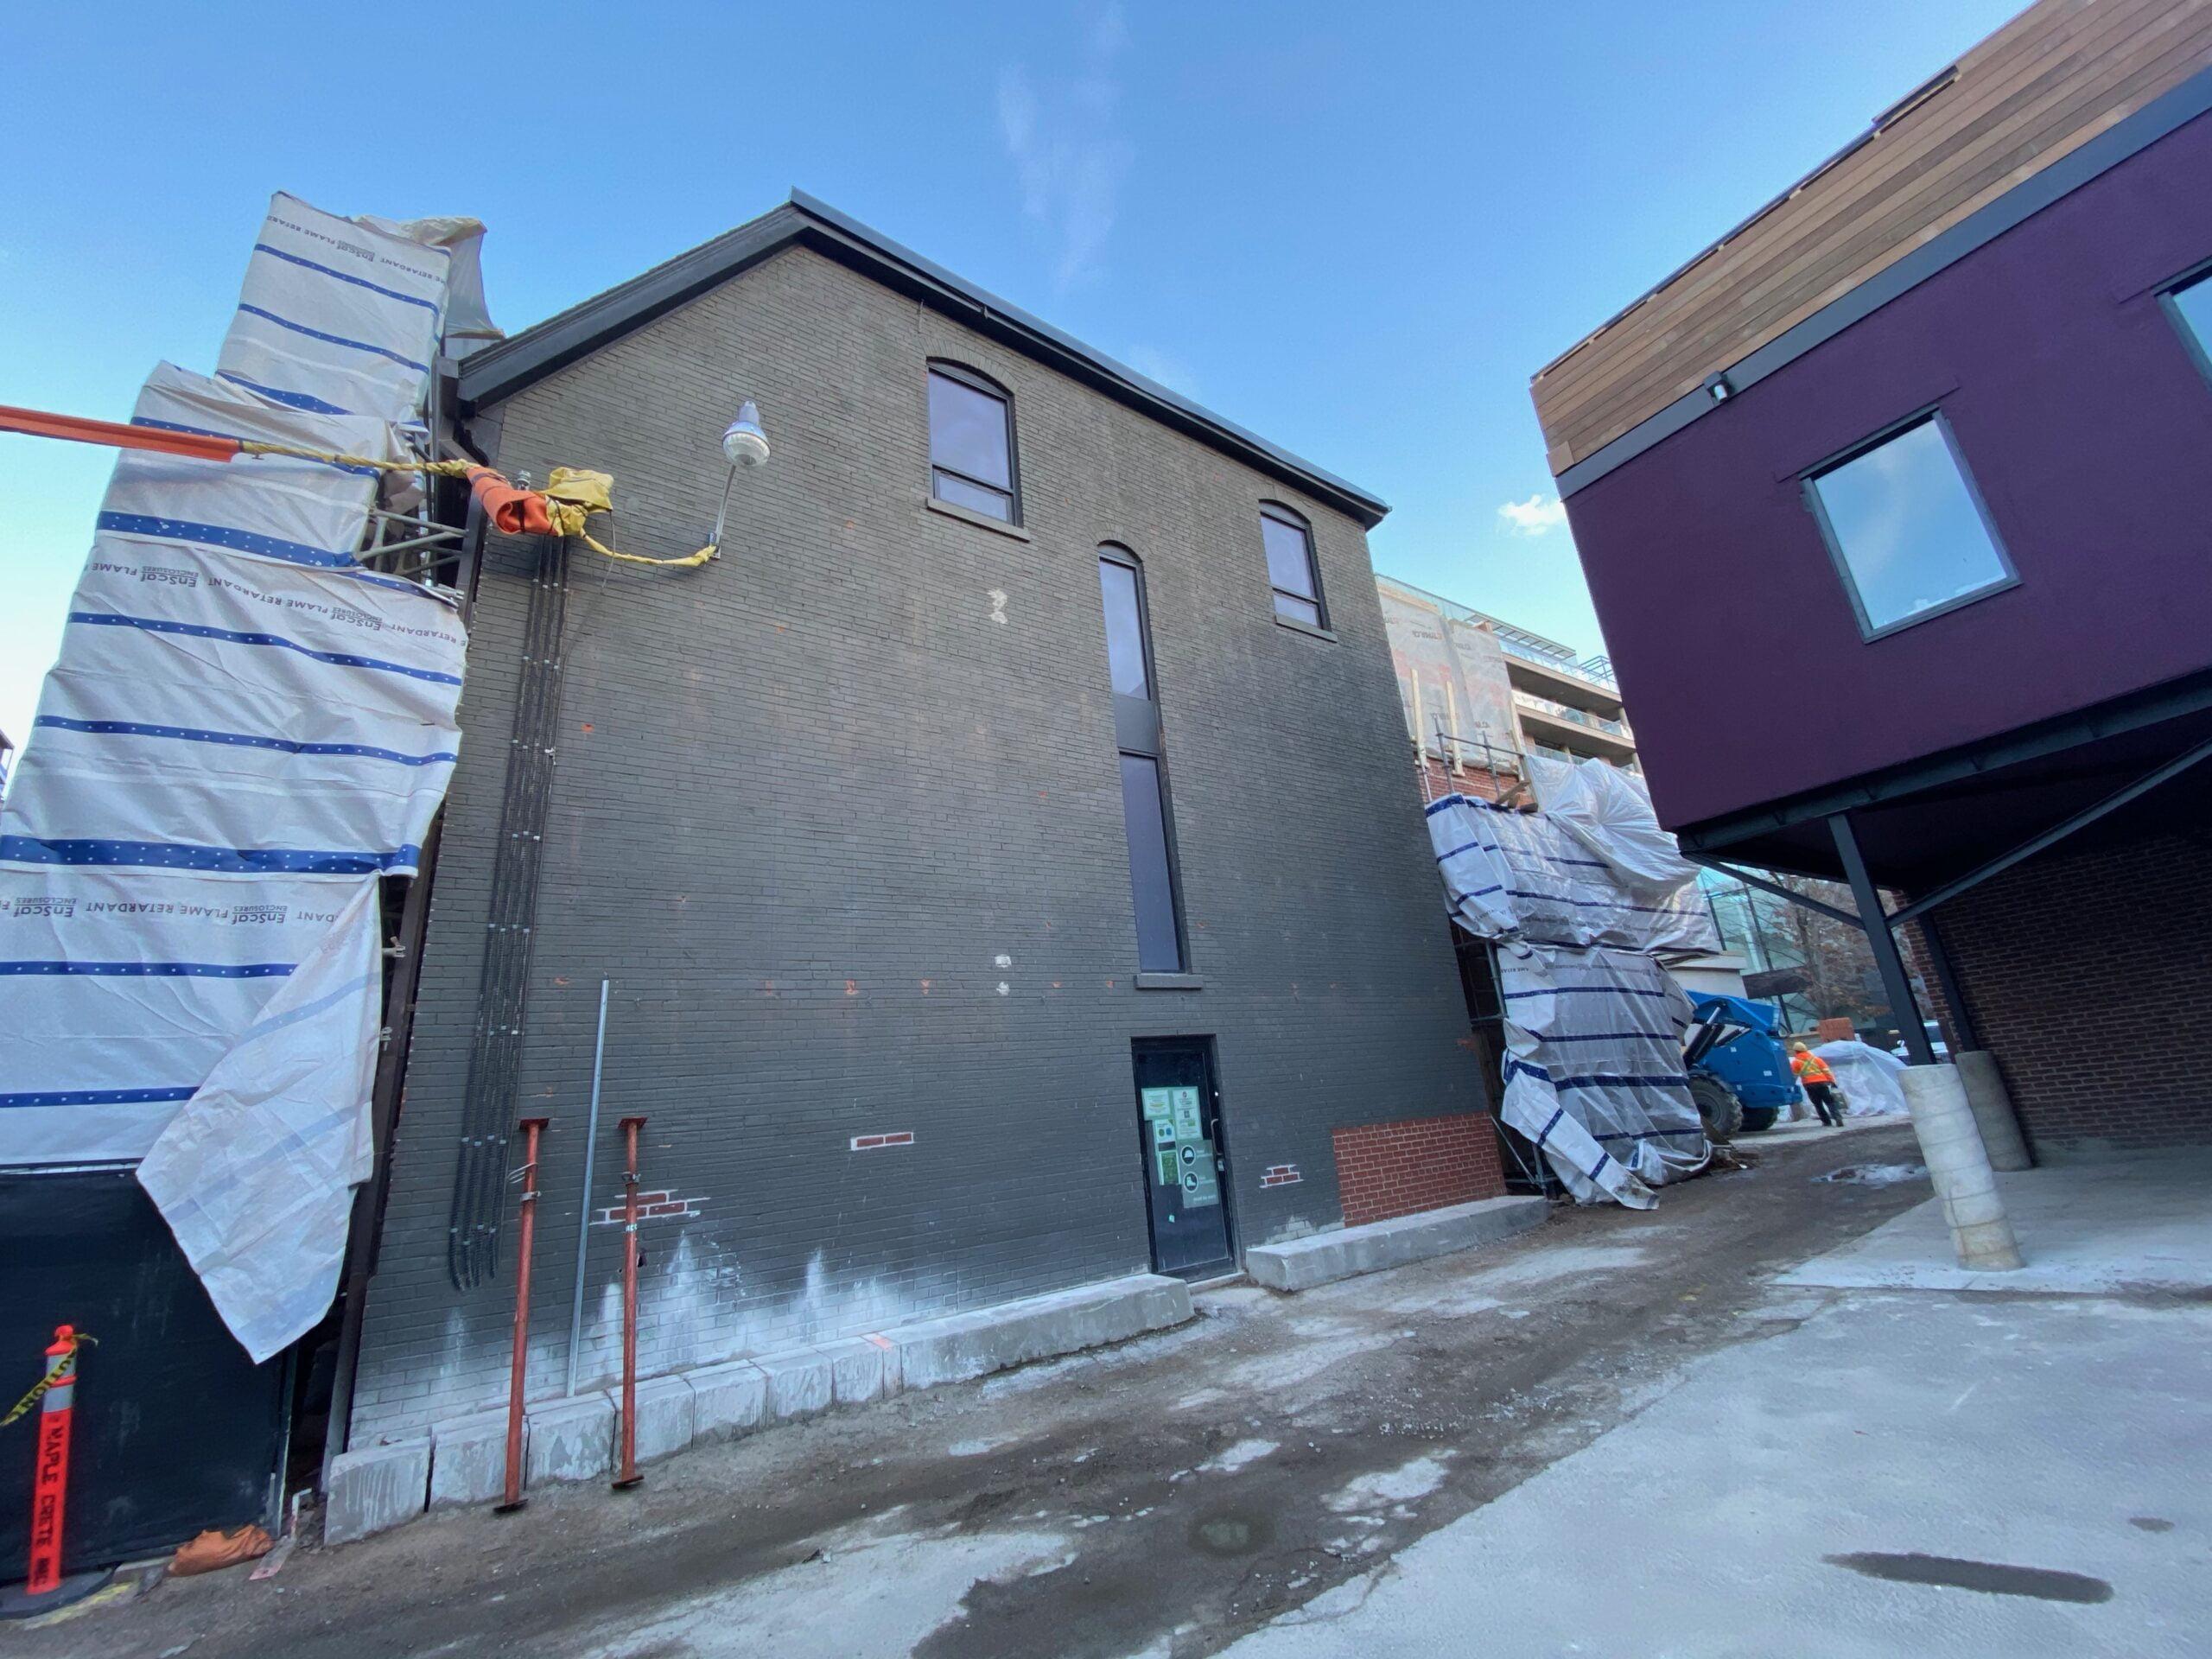 Construction beginning at 121 Scollard Street. Photo: Craig Patterson